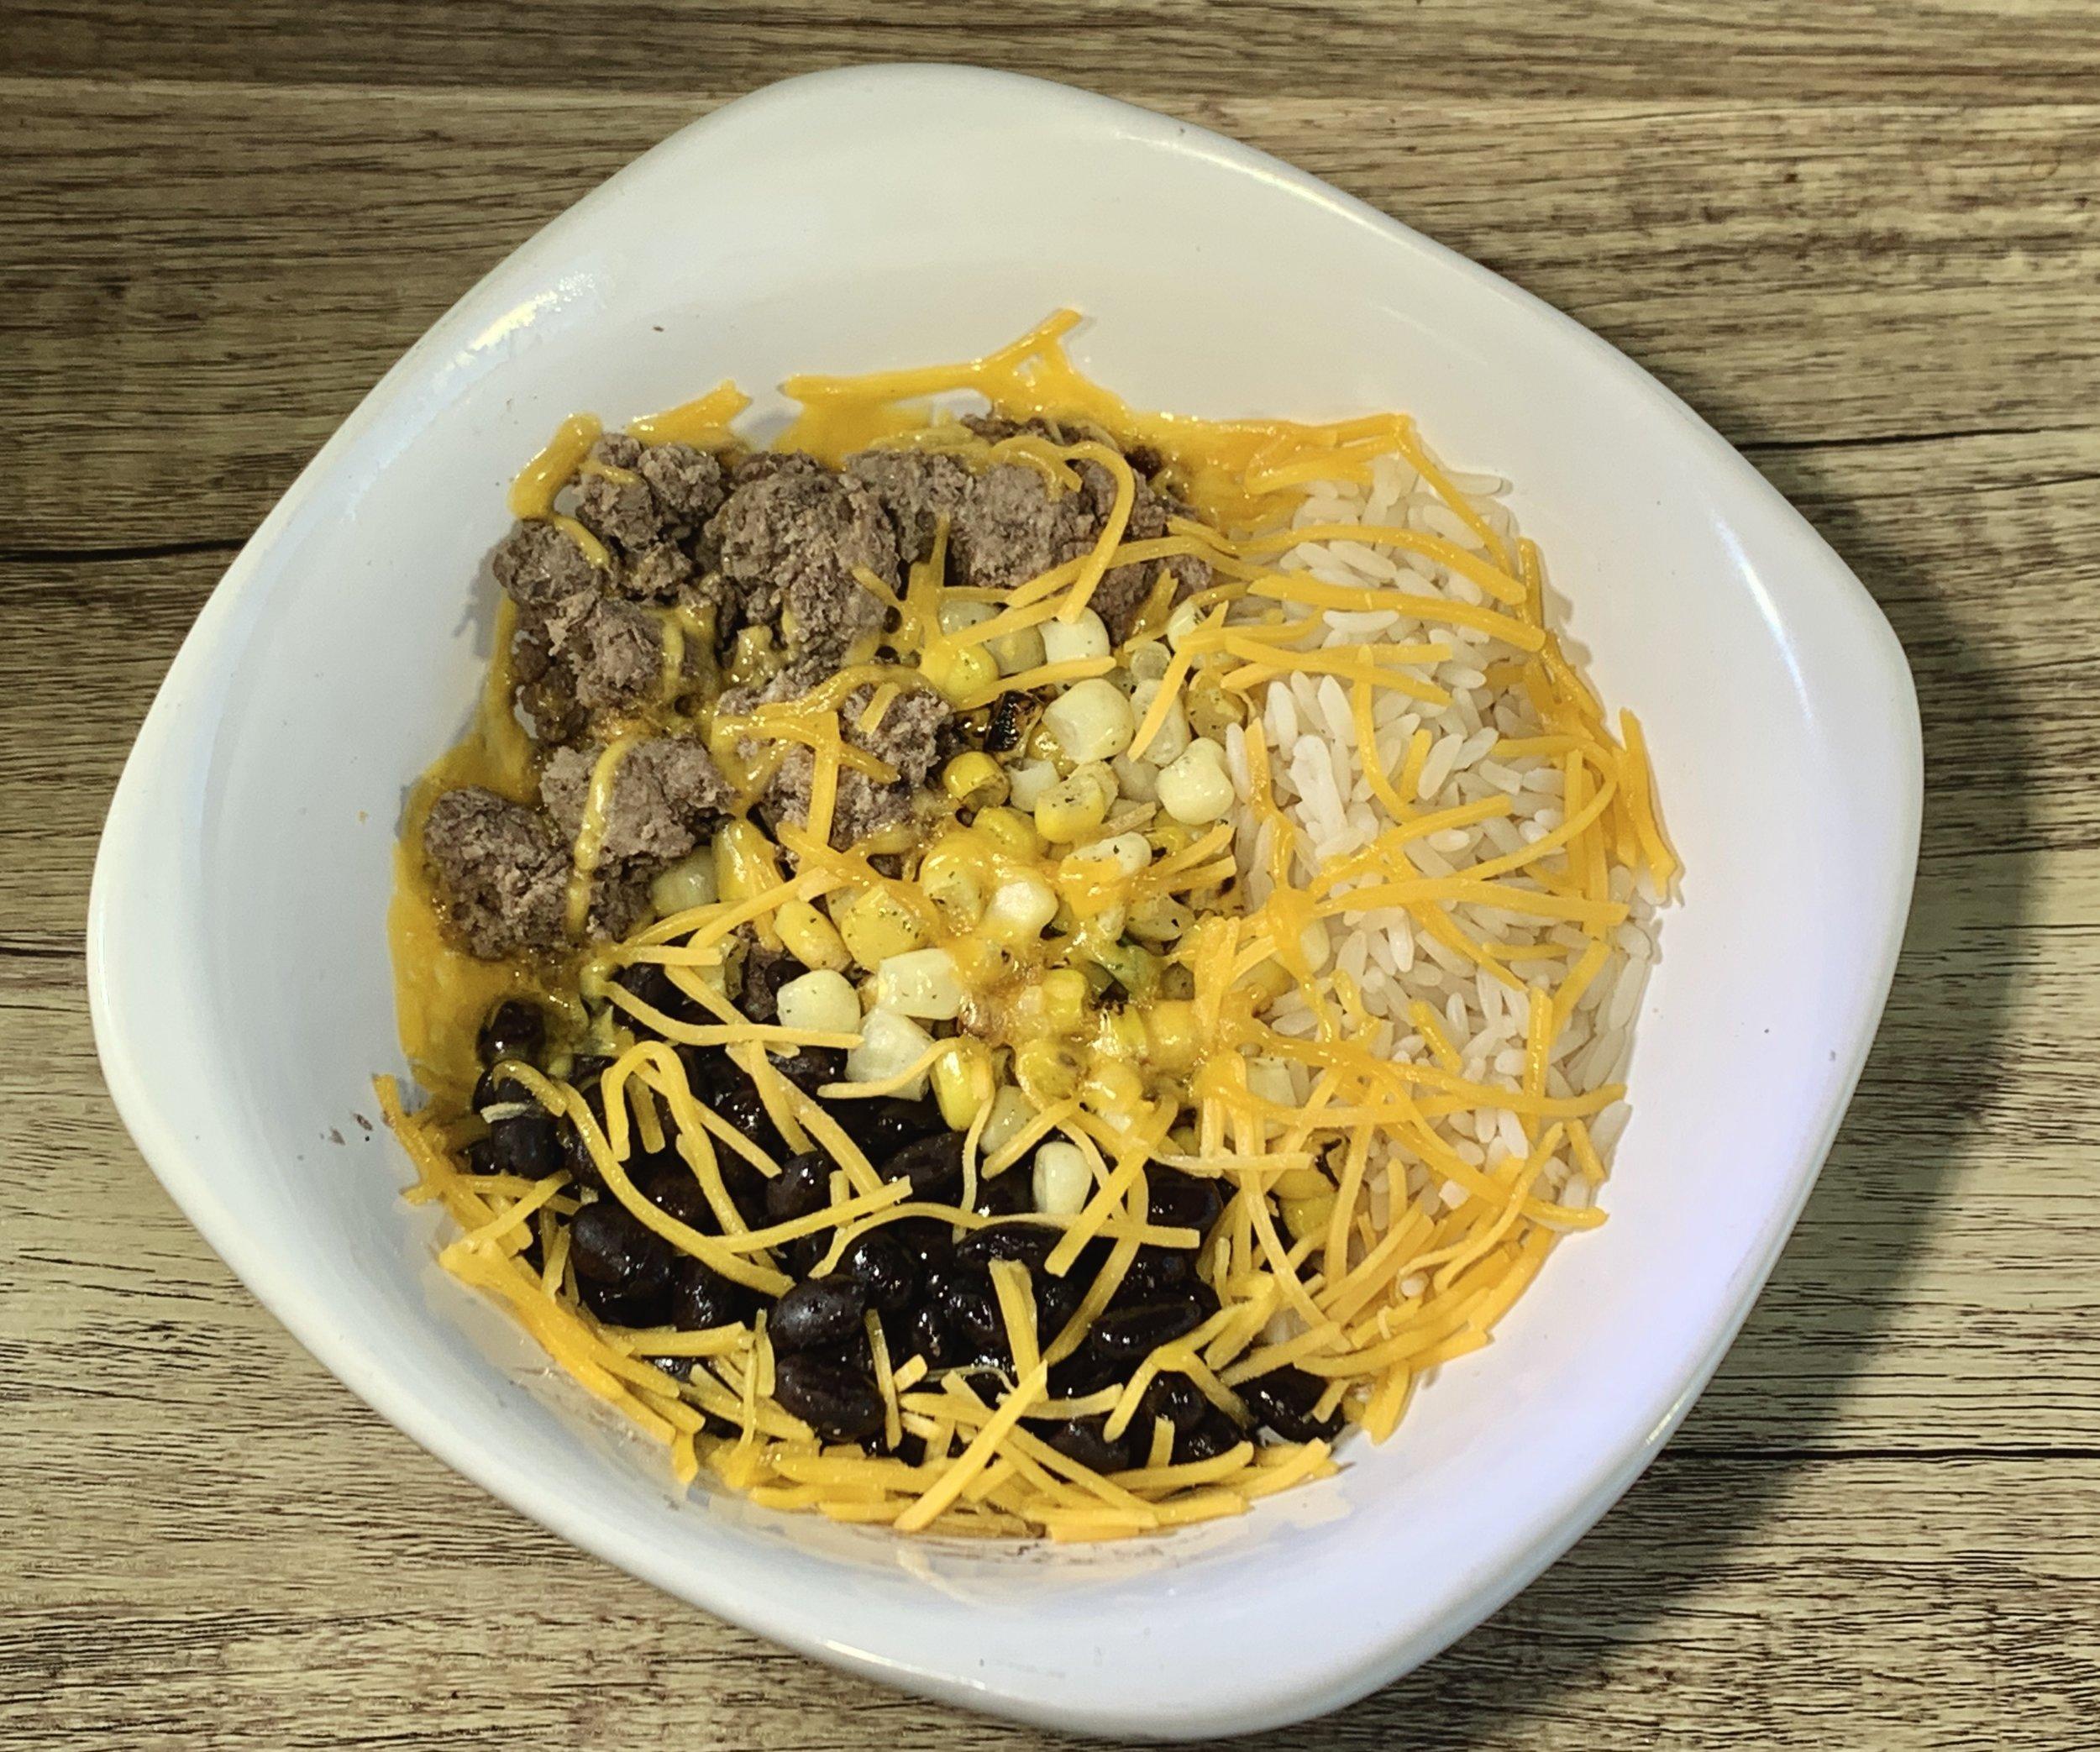 TexMex Taco Bowl - Calories: 390Carbs: 42 gramsFat: 10 gramsProtein: 33 gramsContains: dairy